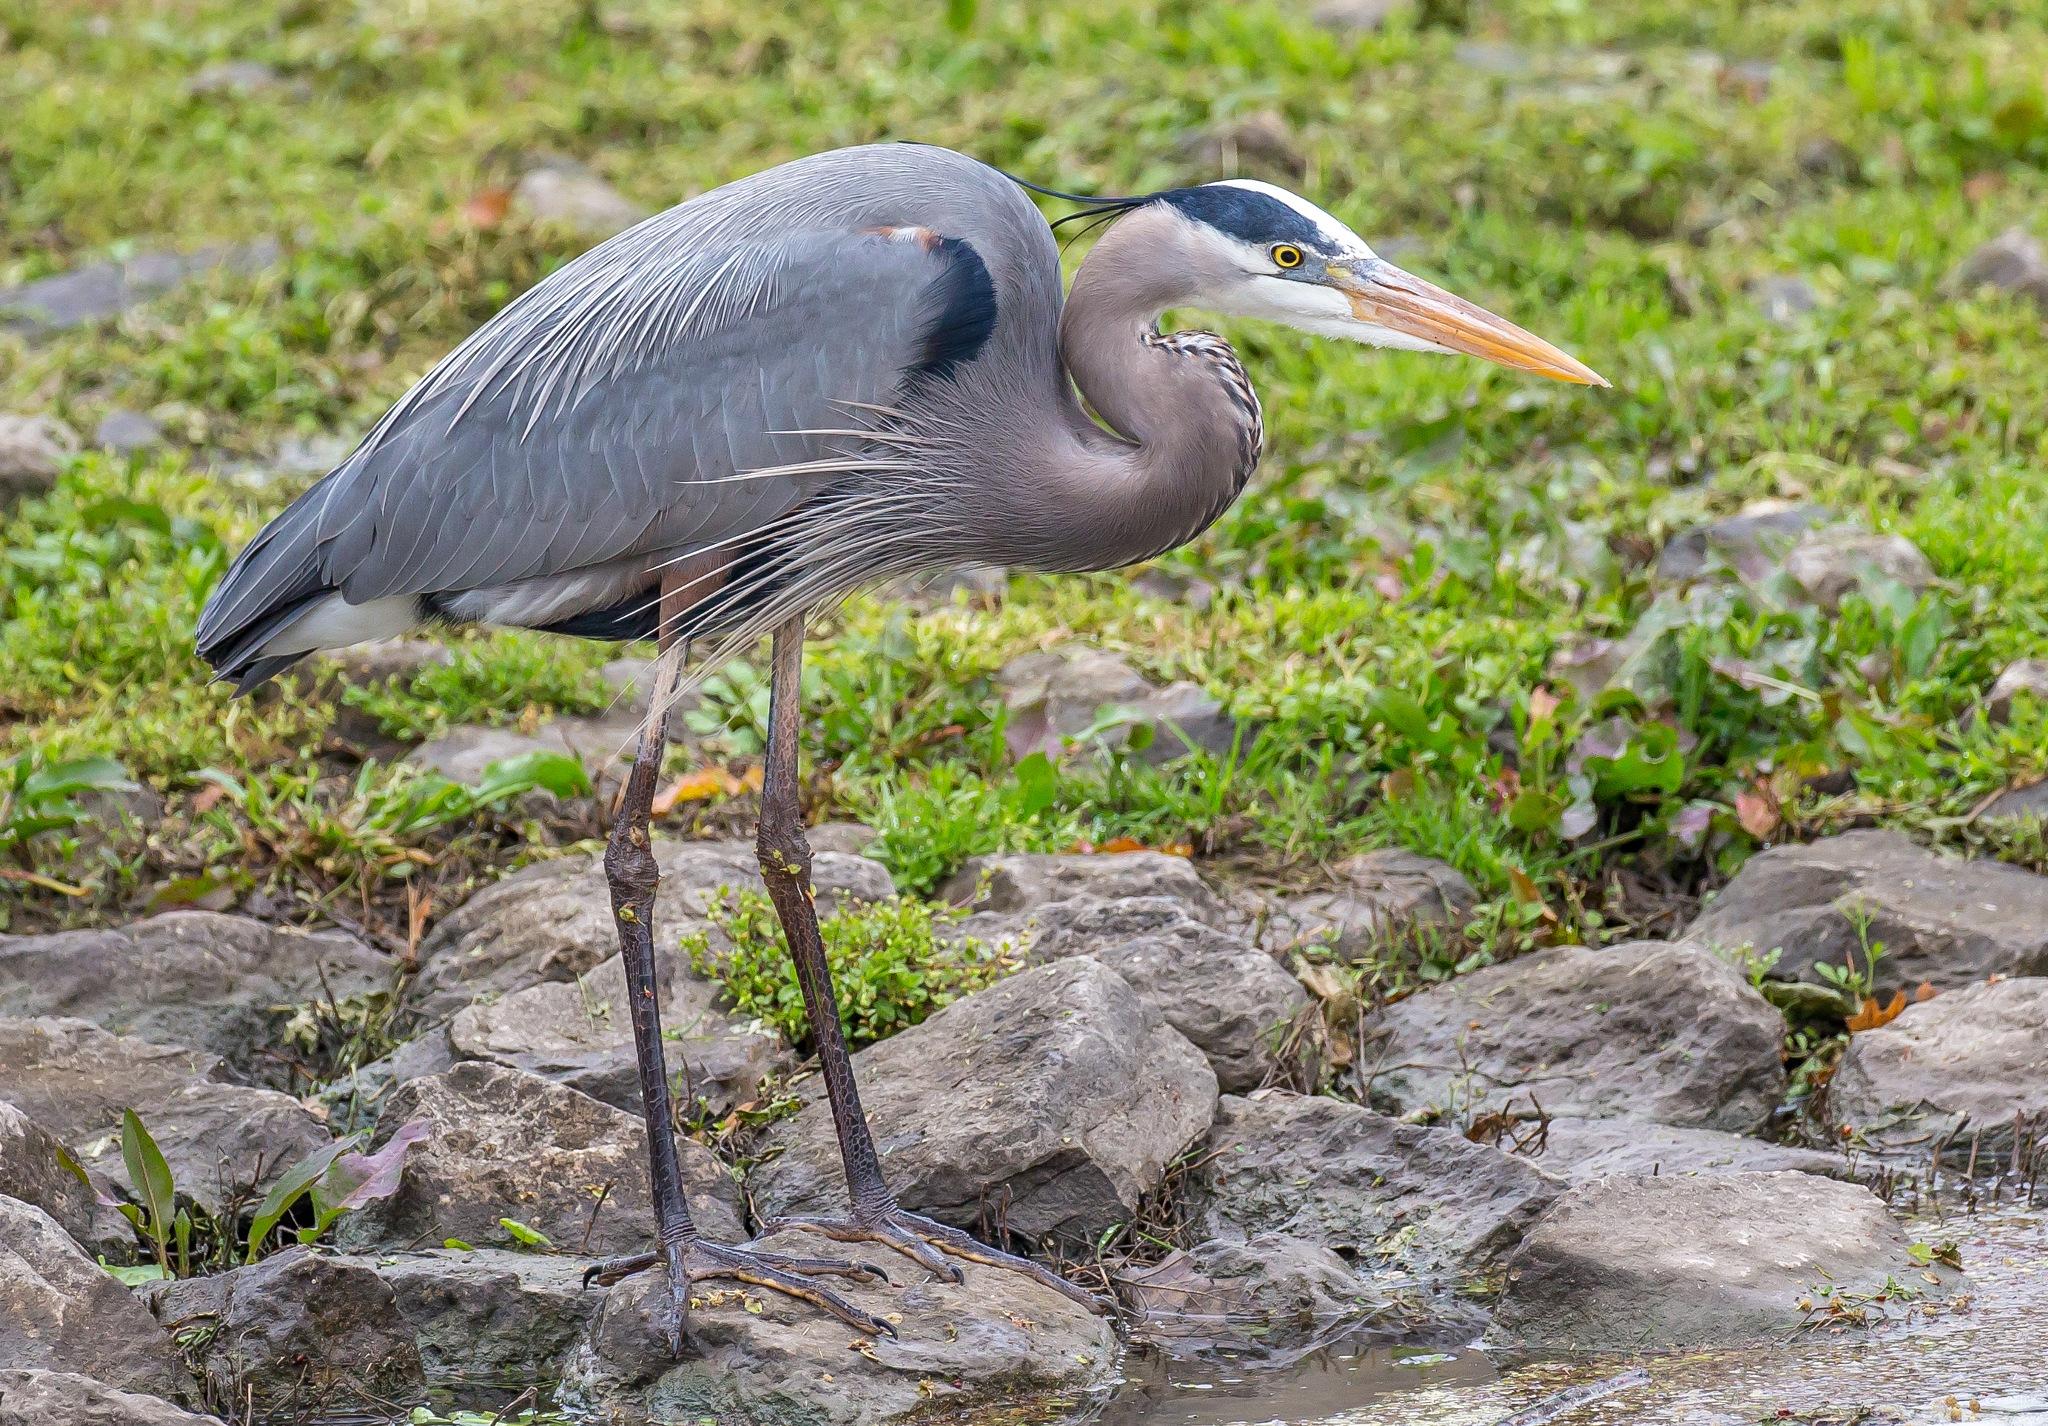 Blue Heron by Robert White